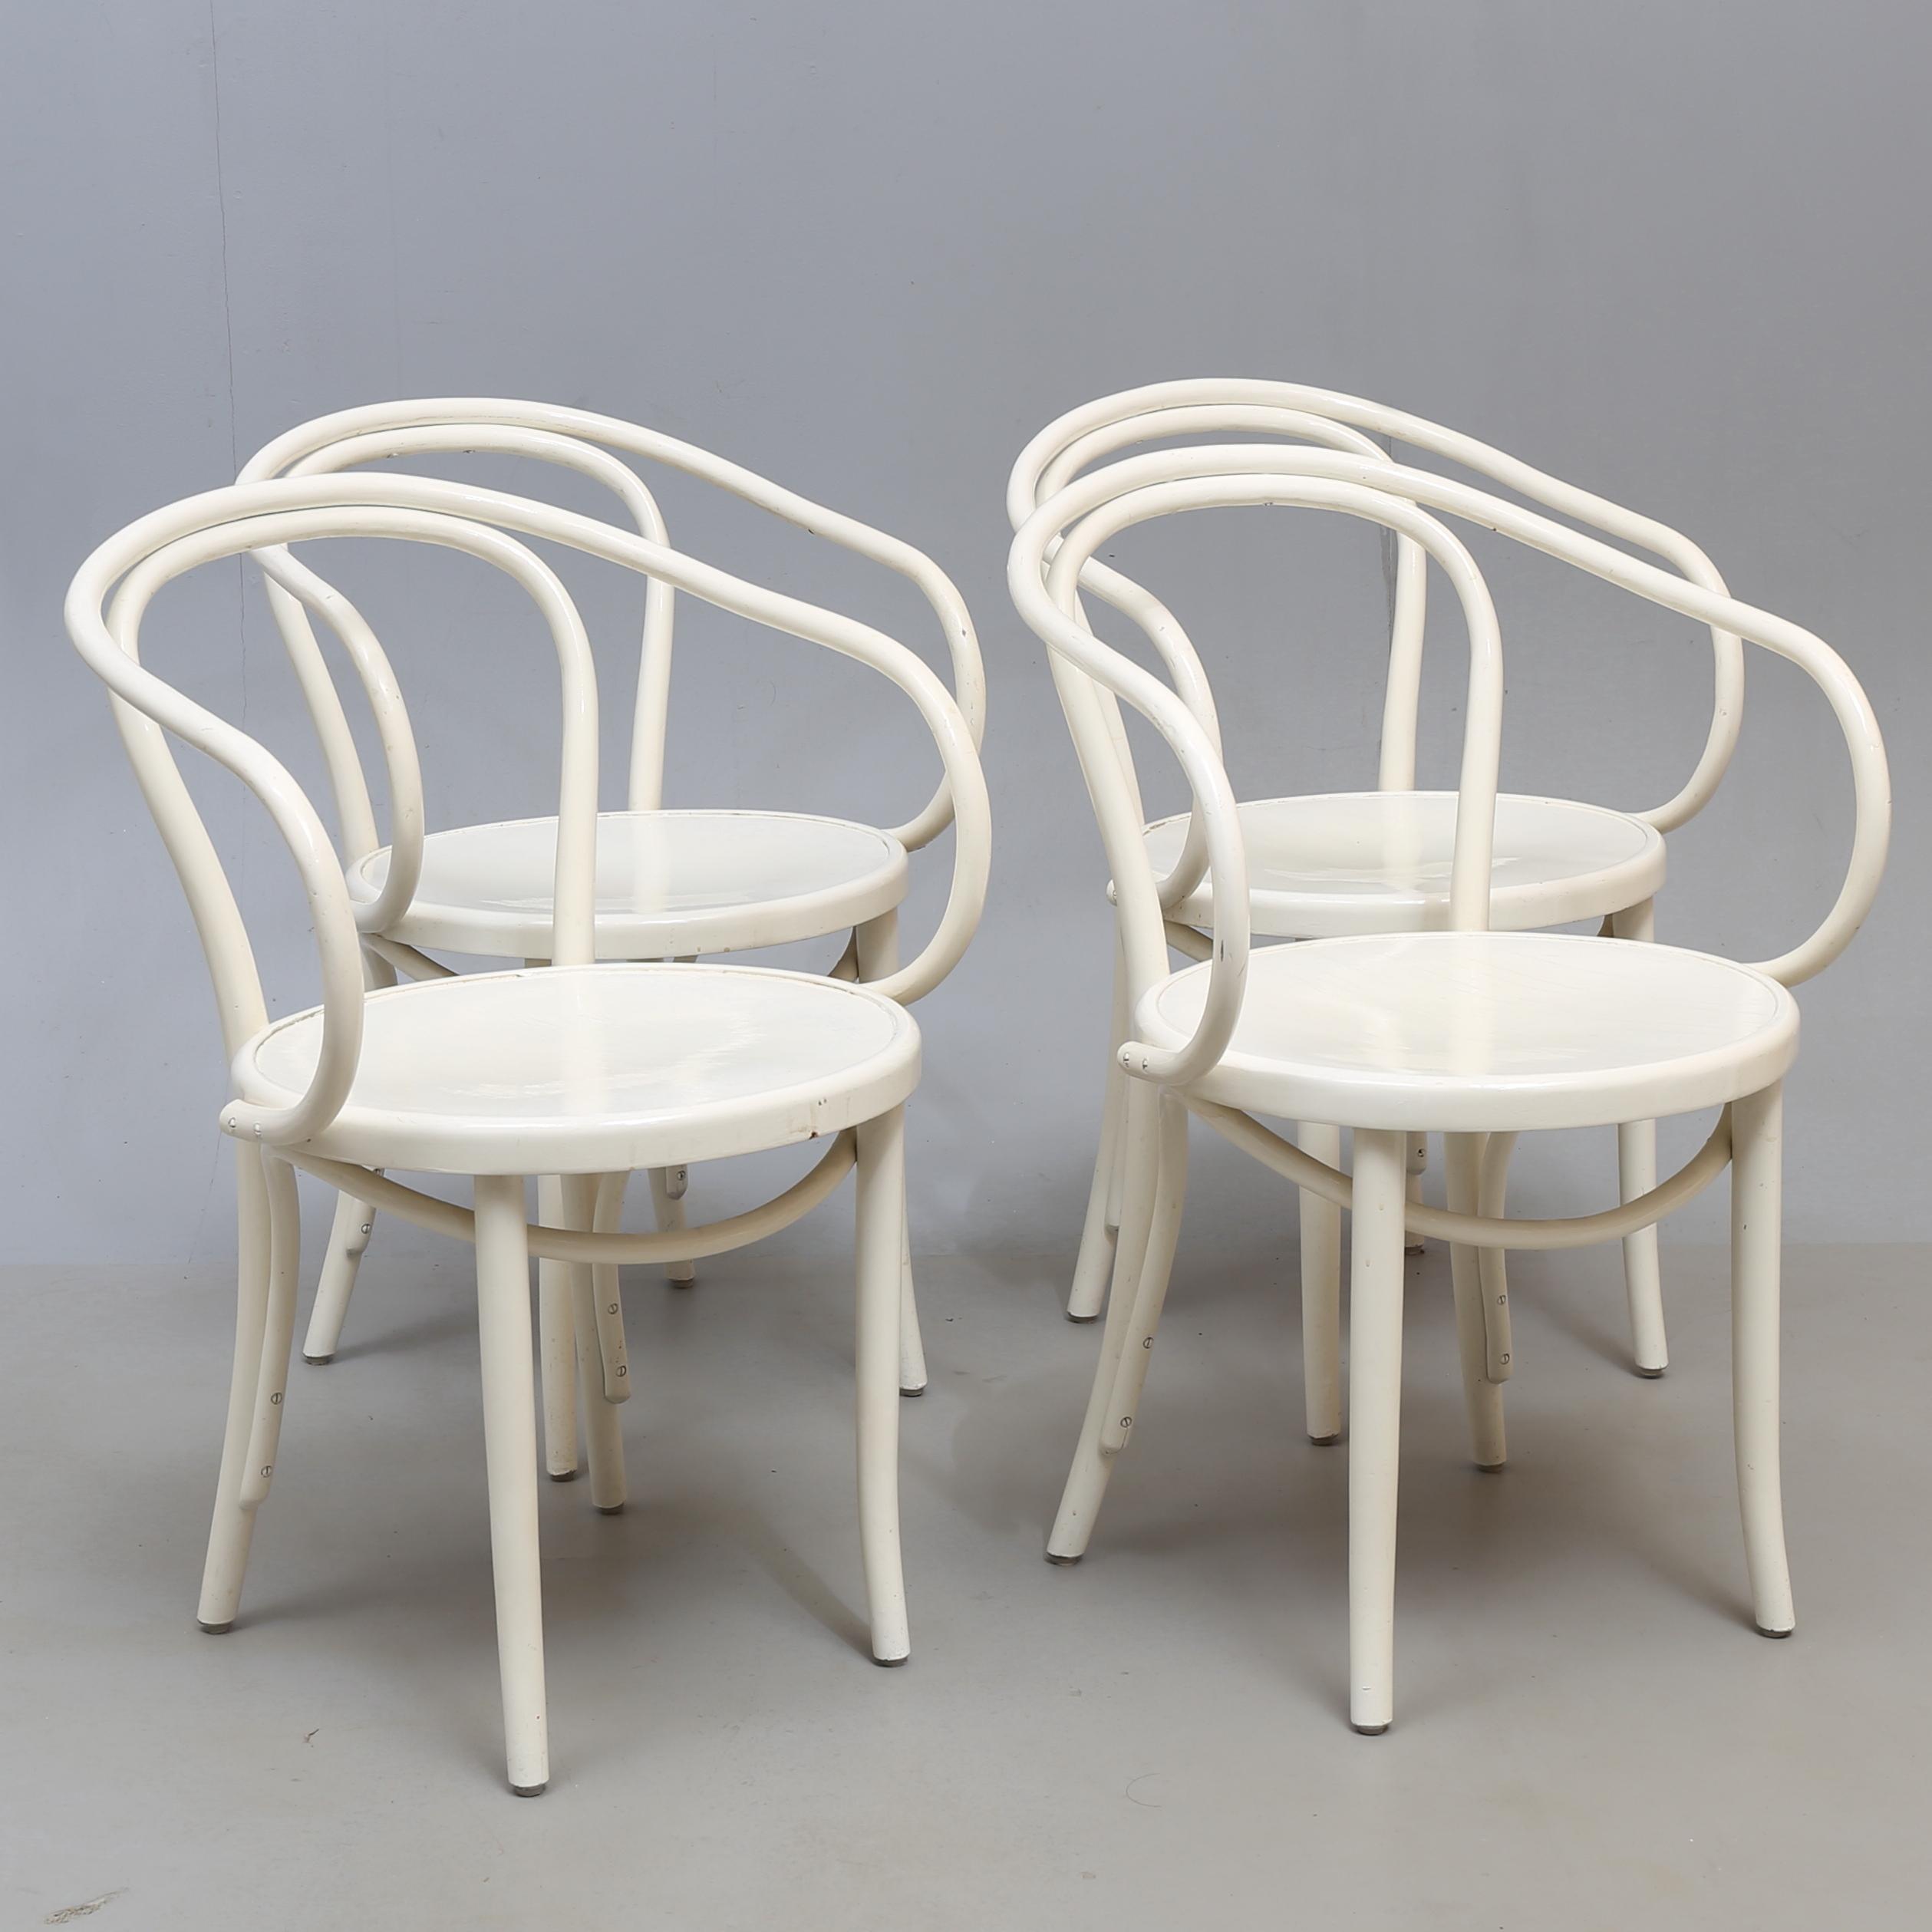 STOLAR, 4st, Thonet Nr 30, Radomsko, IKEA, 1900 tal. Möbler